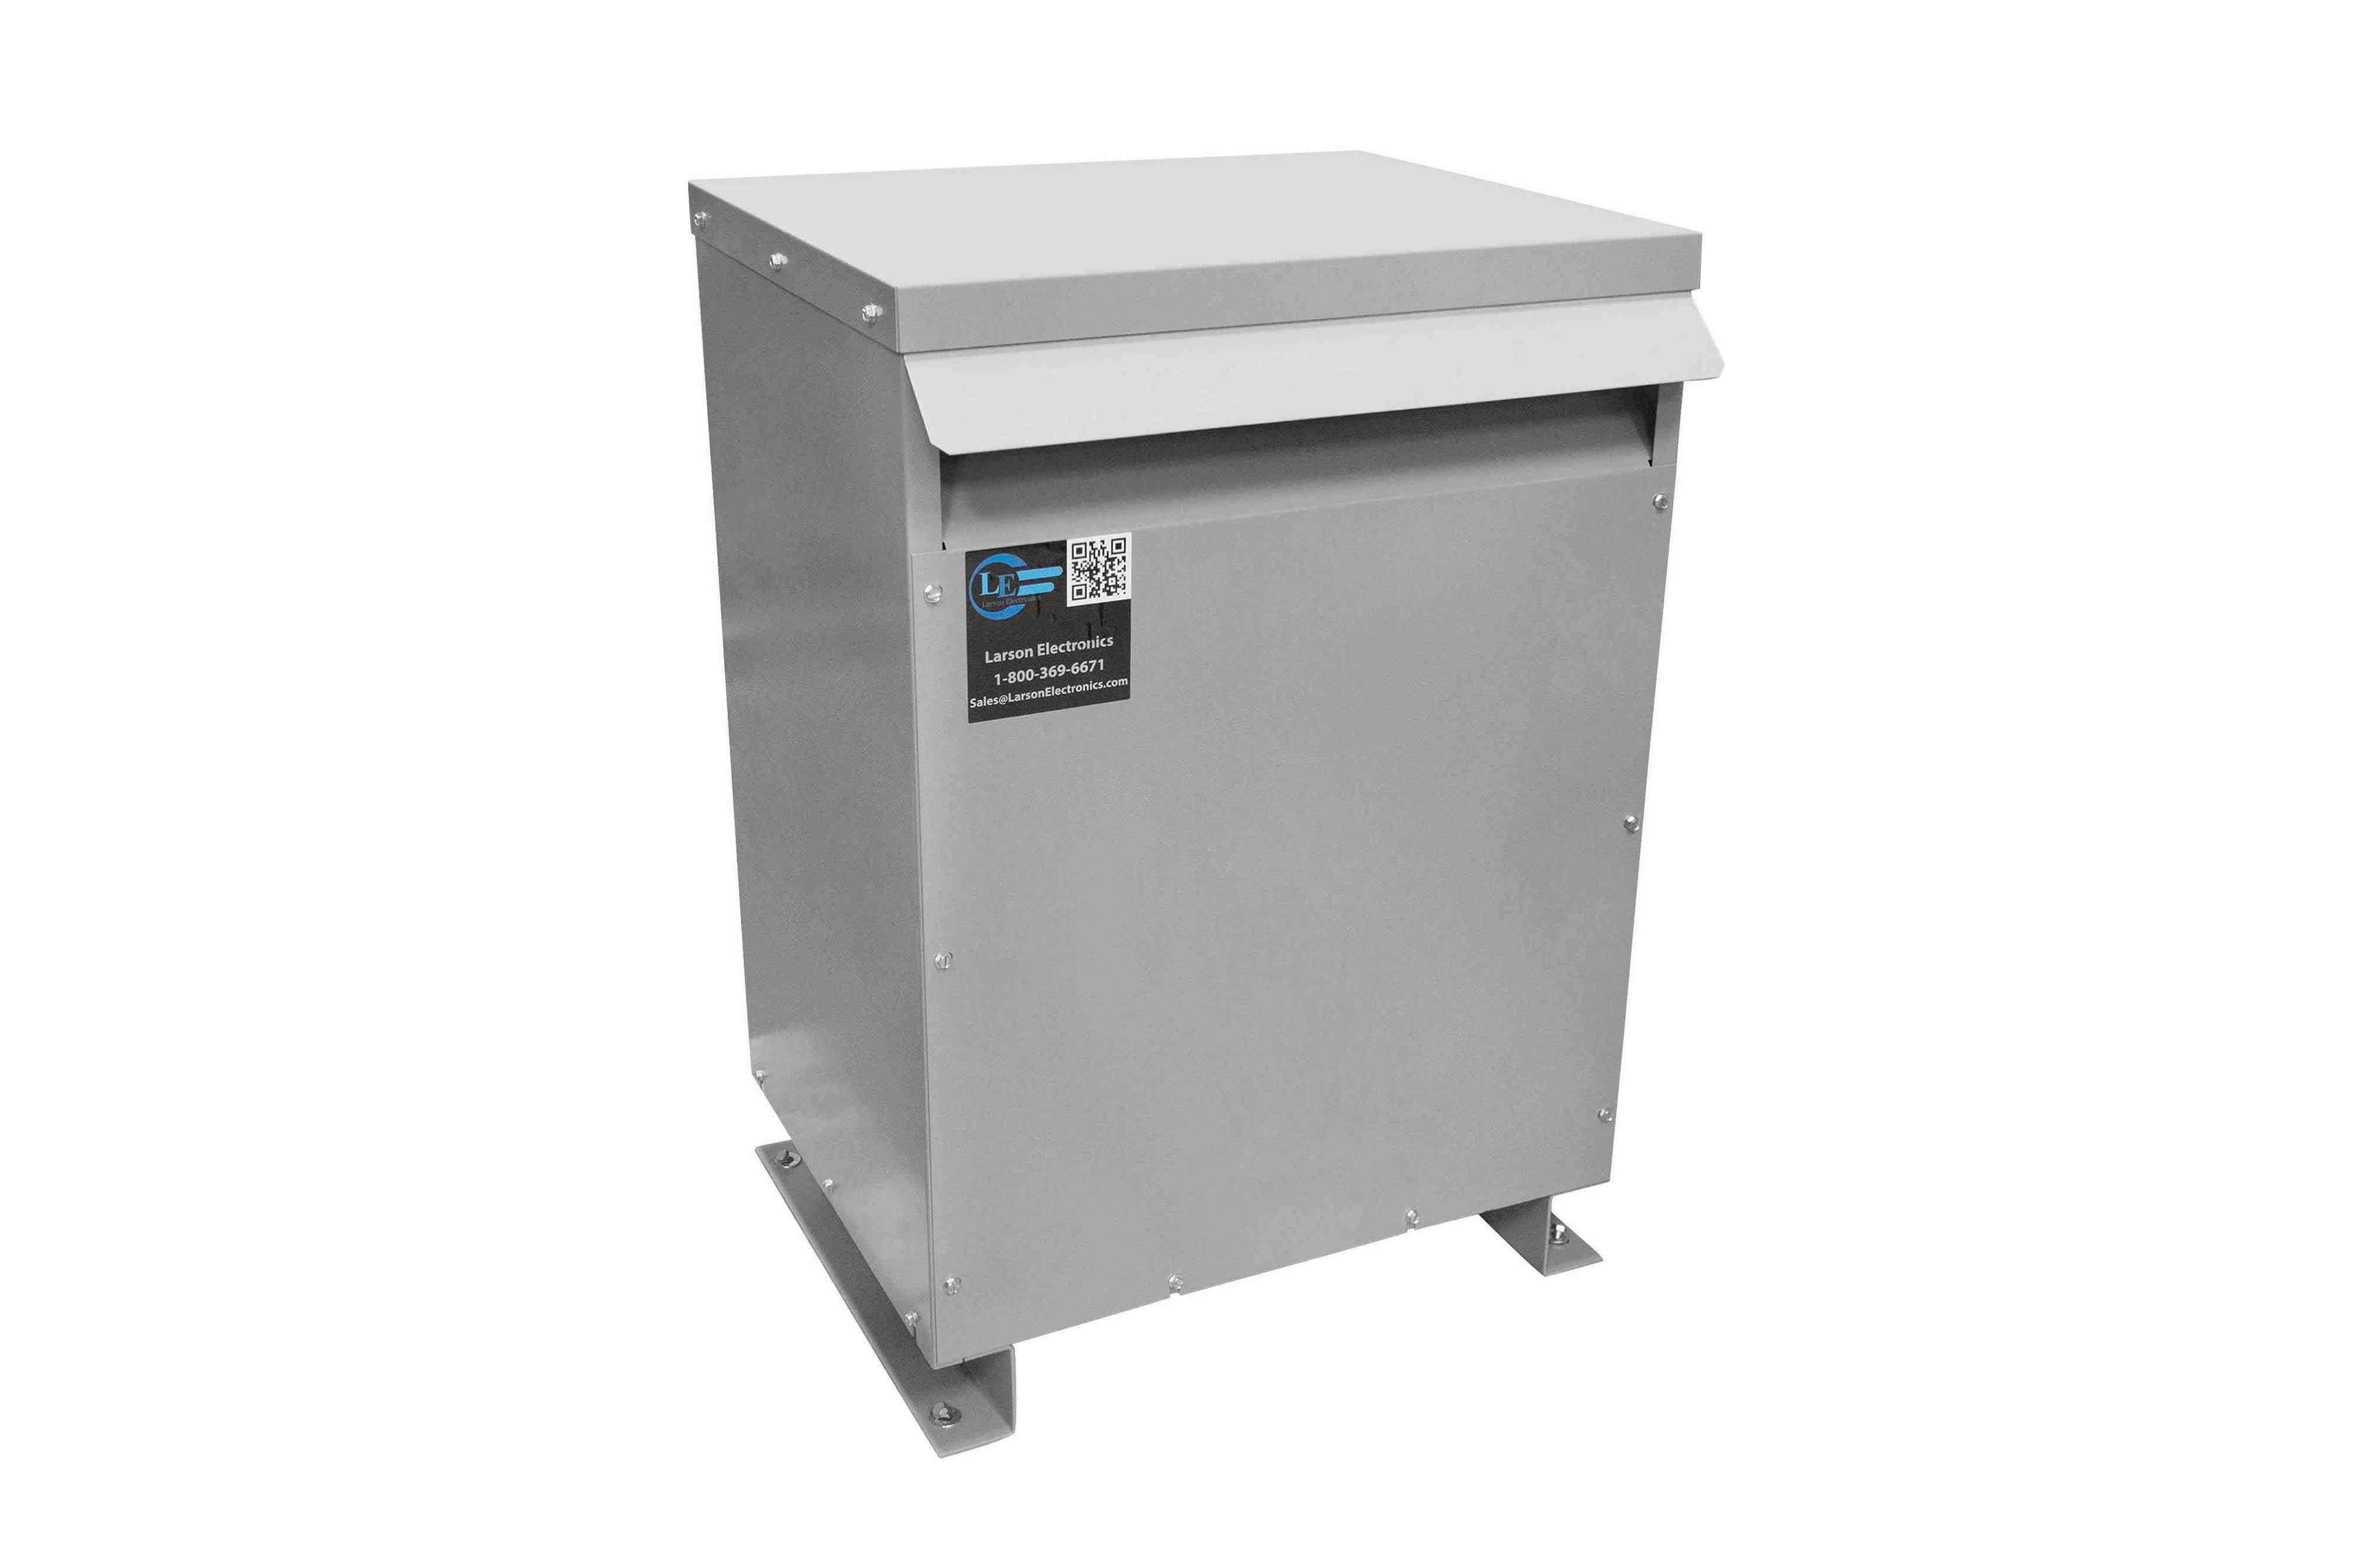 27 kVA 3PH Isolation Transformer, 600V Wye Primary, 208Y/120 Wye-N Secondary, N3R, Ventilated, 60 Hz